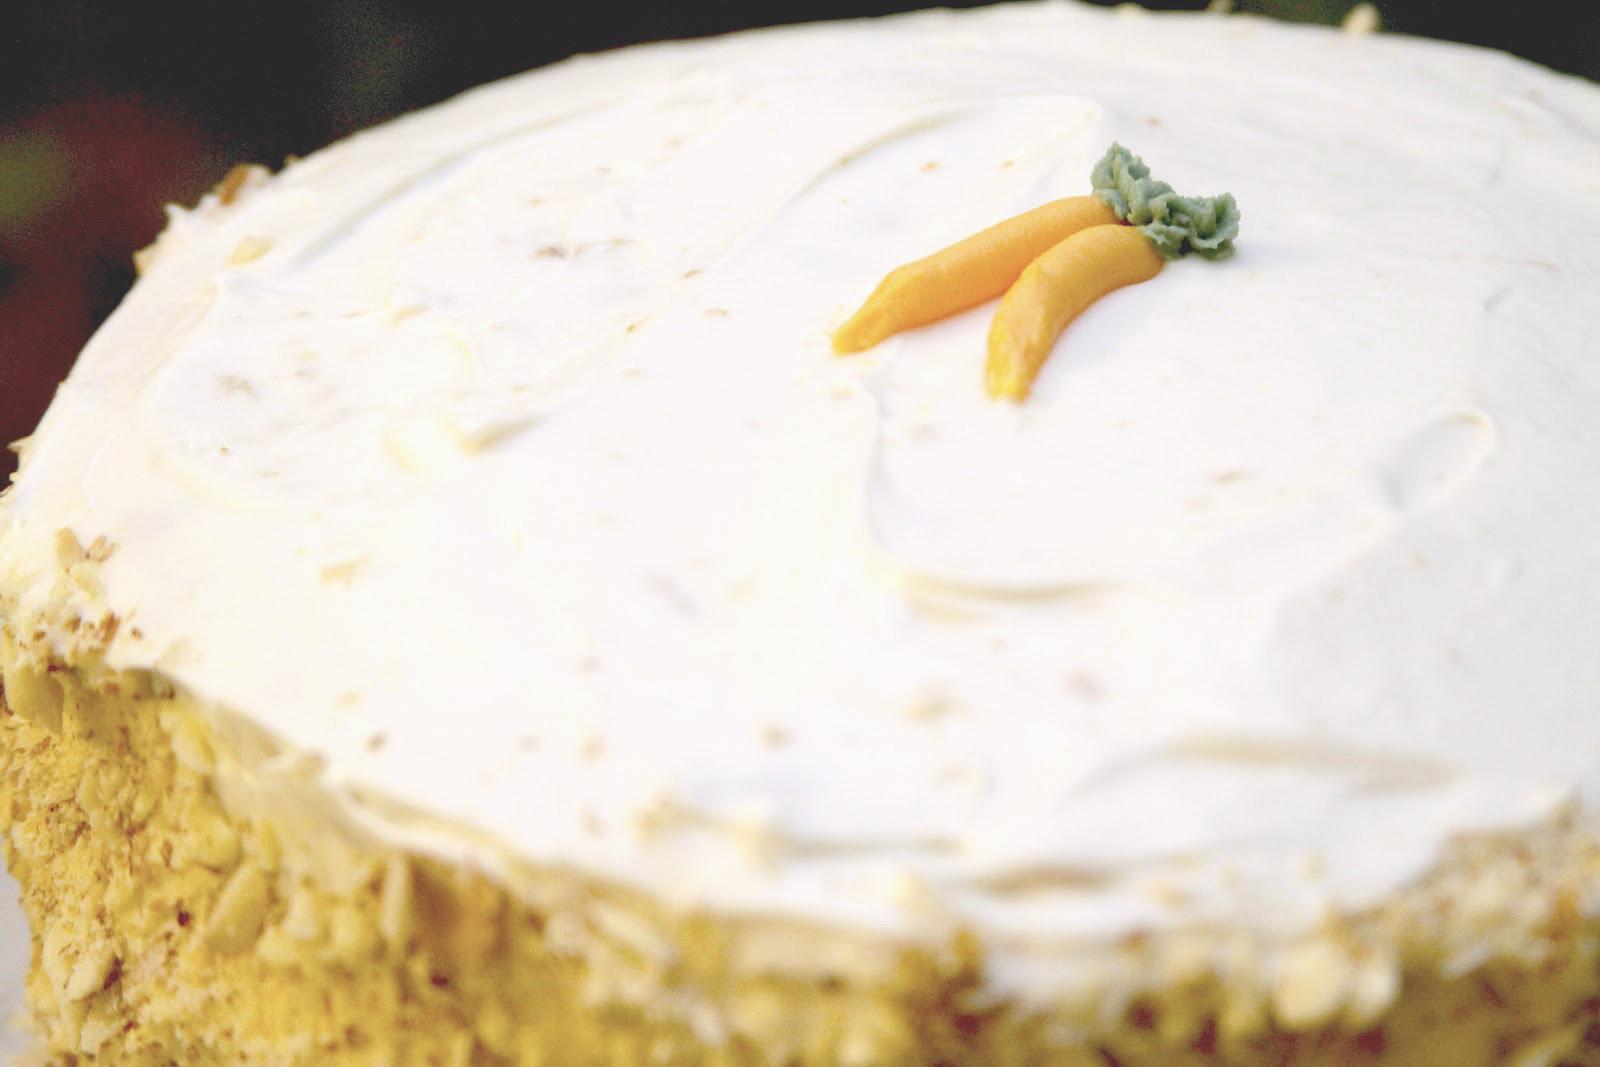 Carrot Cake Recipe Uk No Nuts: Sweet-E: Carrot Cake